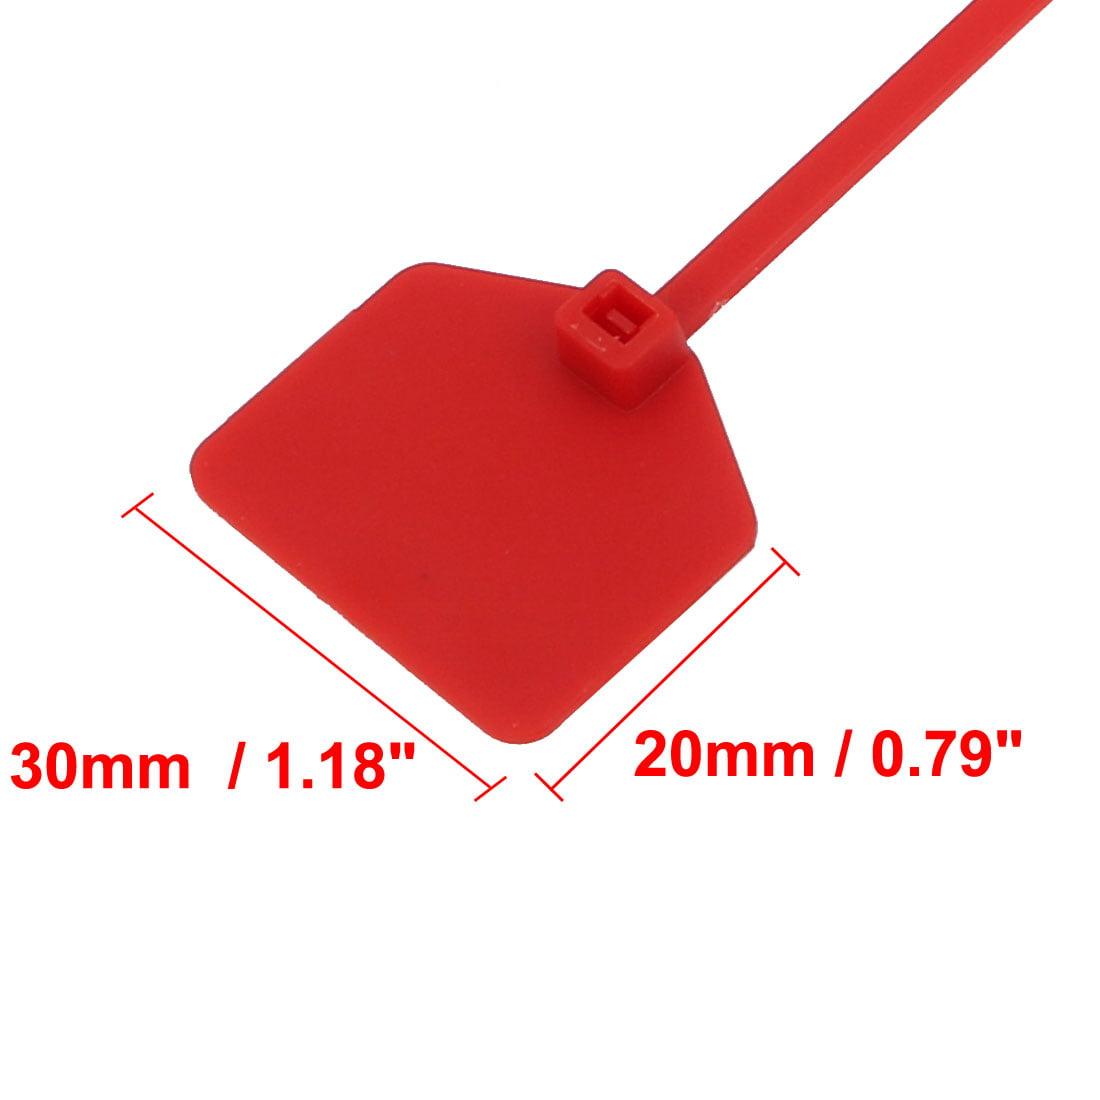 50pcs 220mm Length Nylon Self-Locking 30mm x 20mm Label Cable Tie Zip Red - image 2 de 3